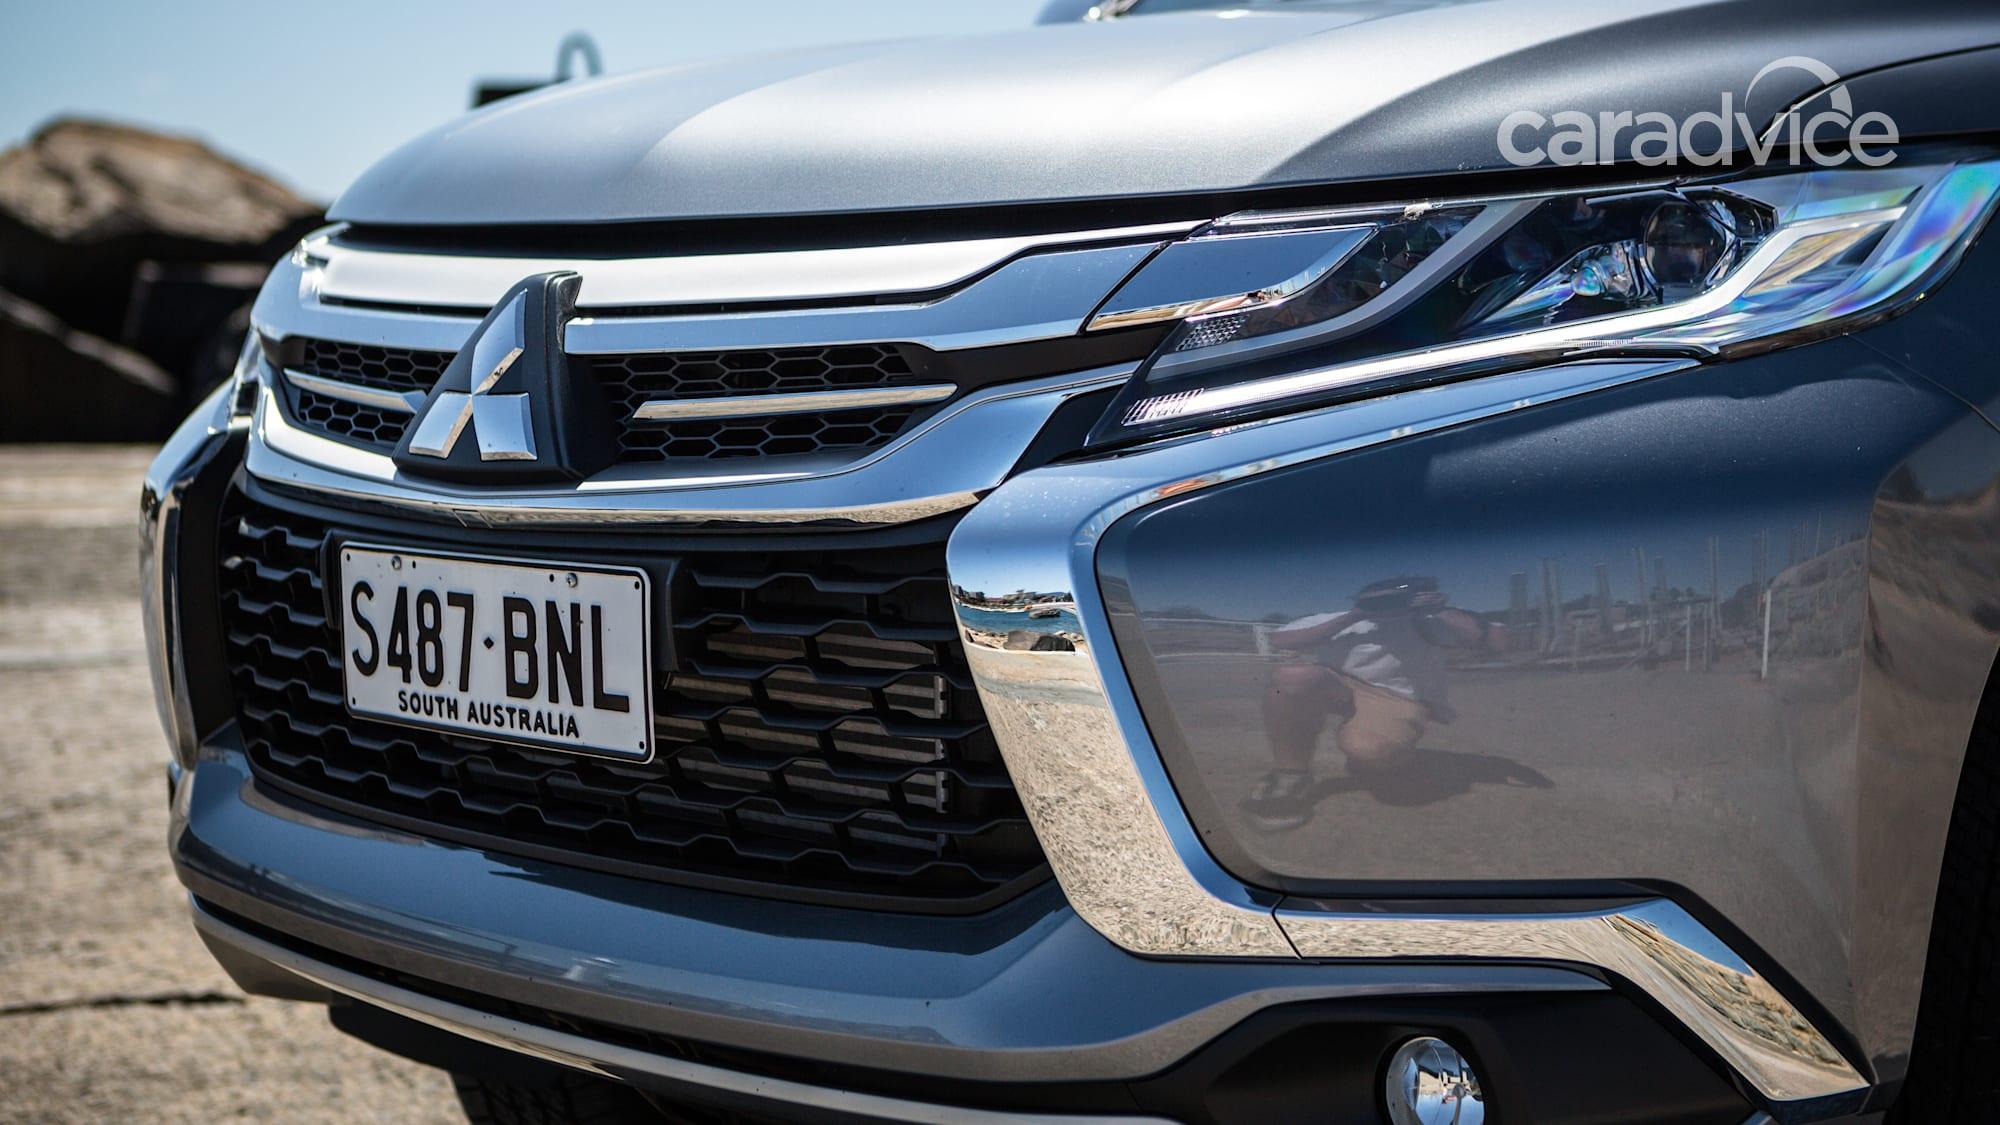 2017 Mitsubishi Pajero Sport GLS towing review | CarAdvice